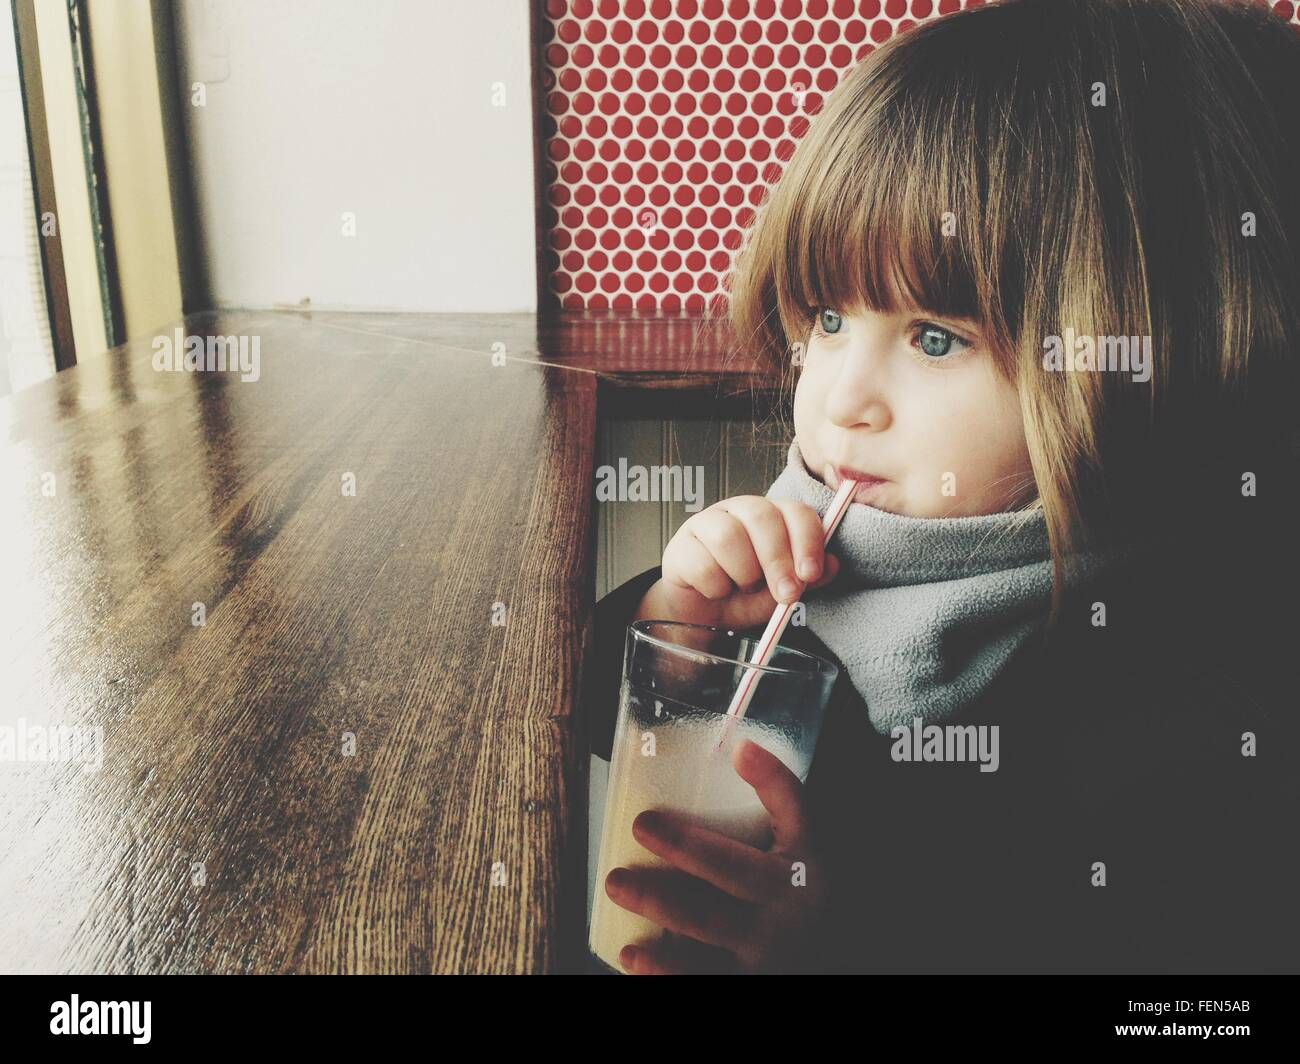 Girl Drinking Juice - Stock Image